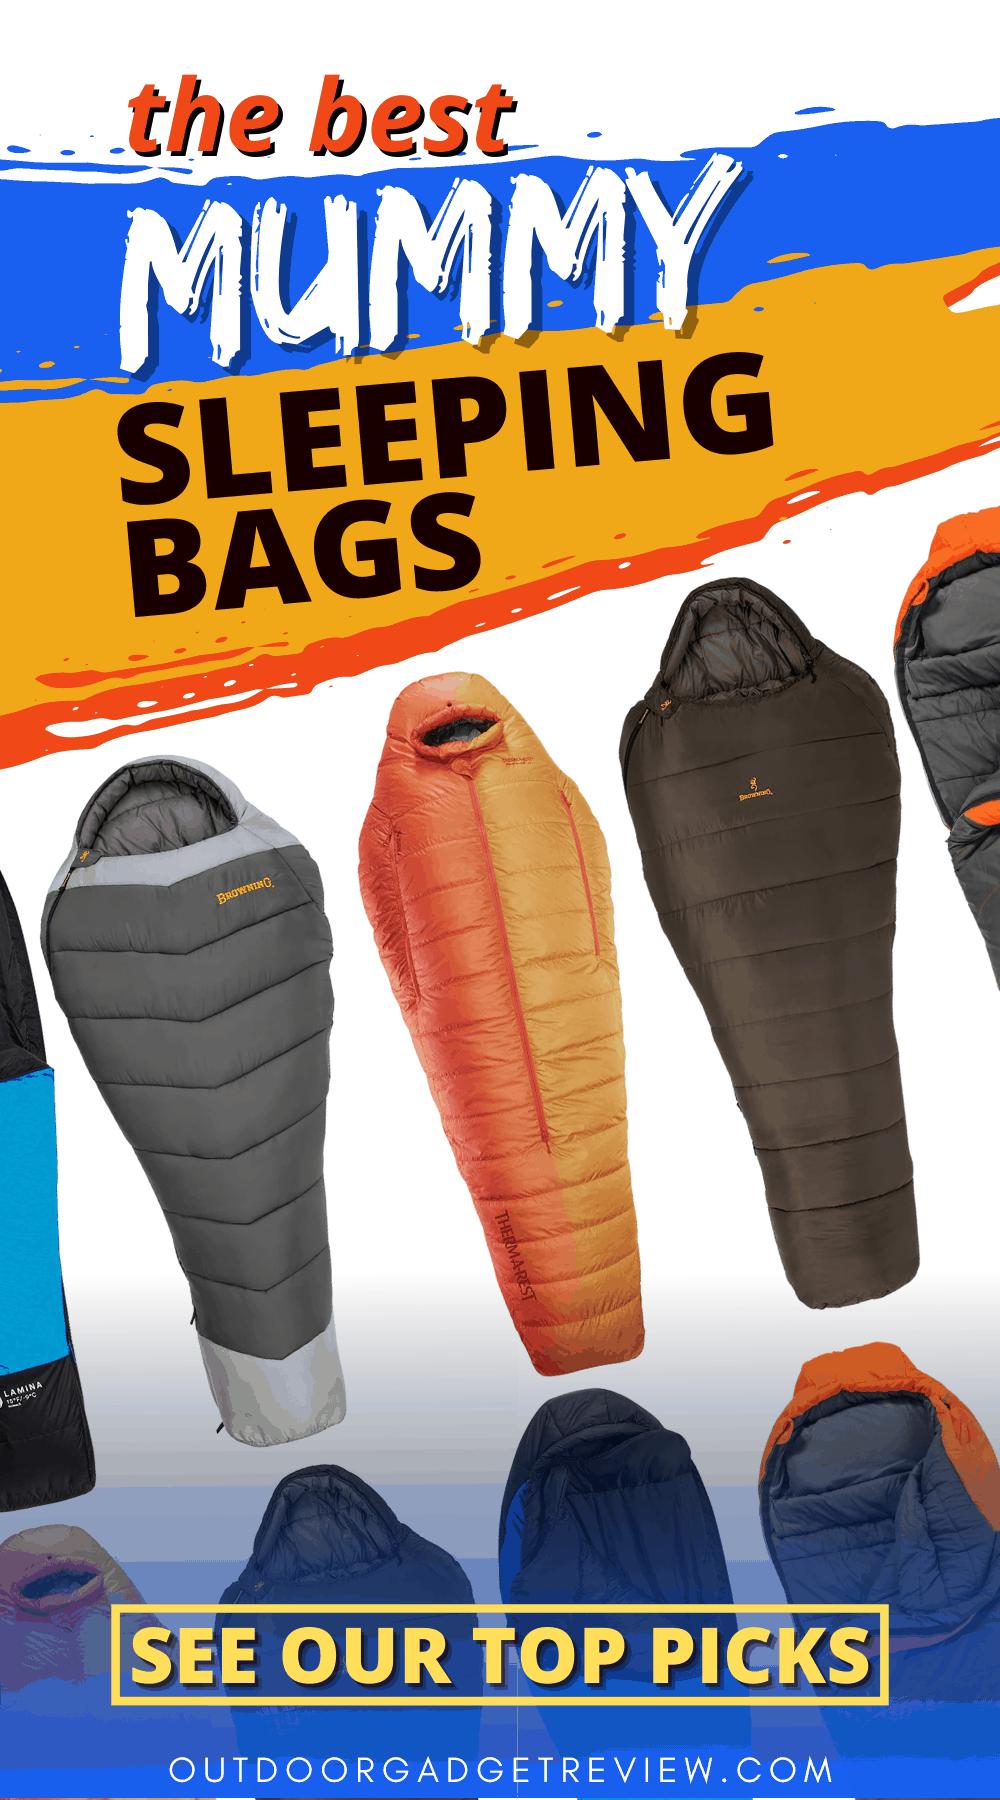 The Best Mummy Sleeping Bags